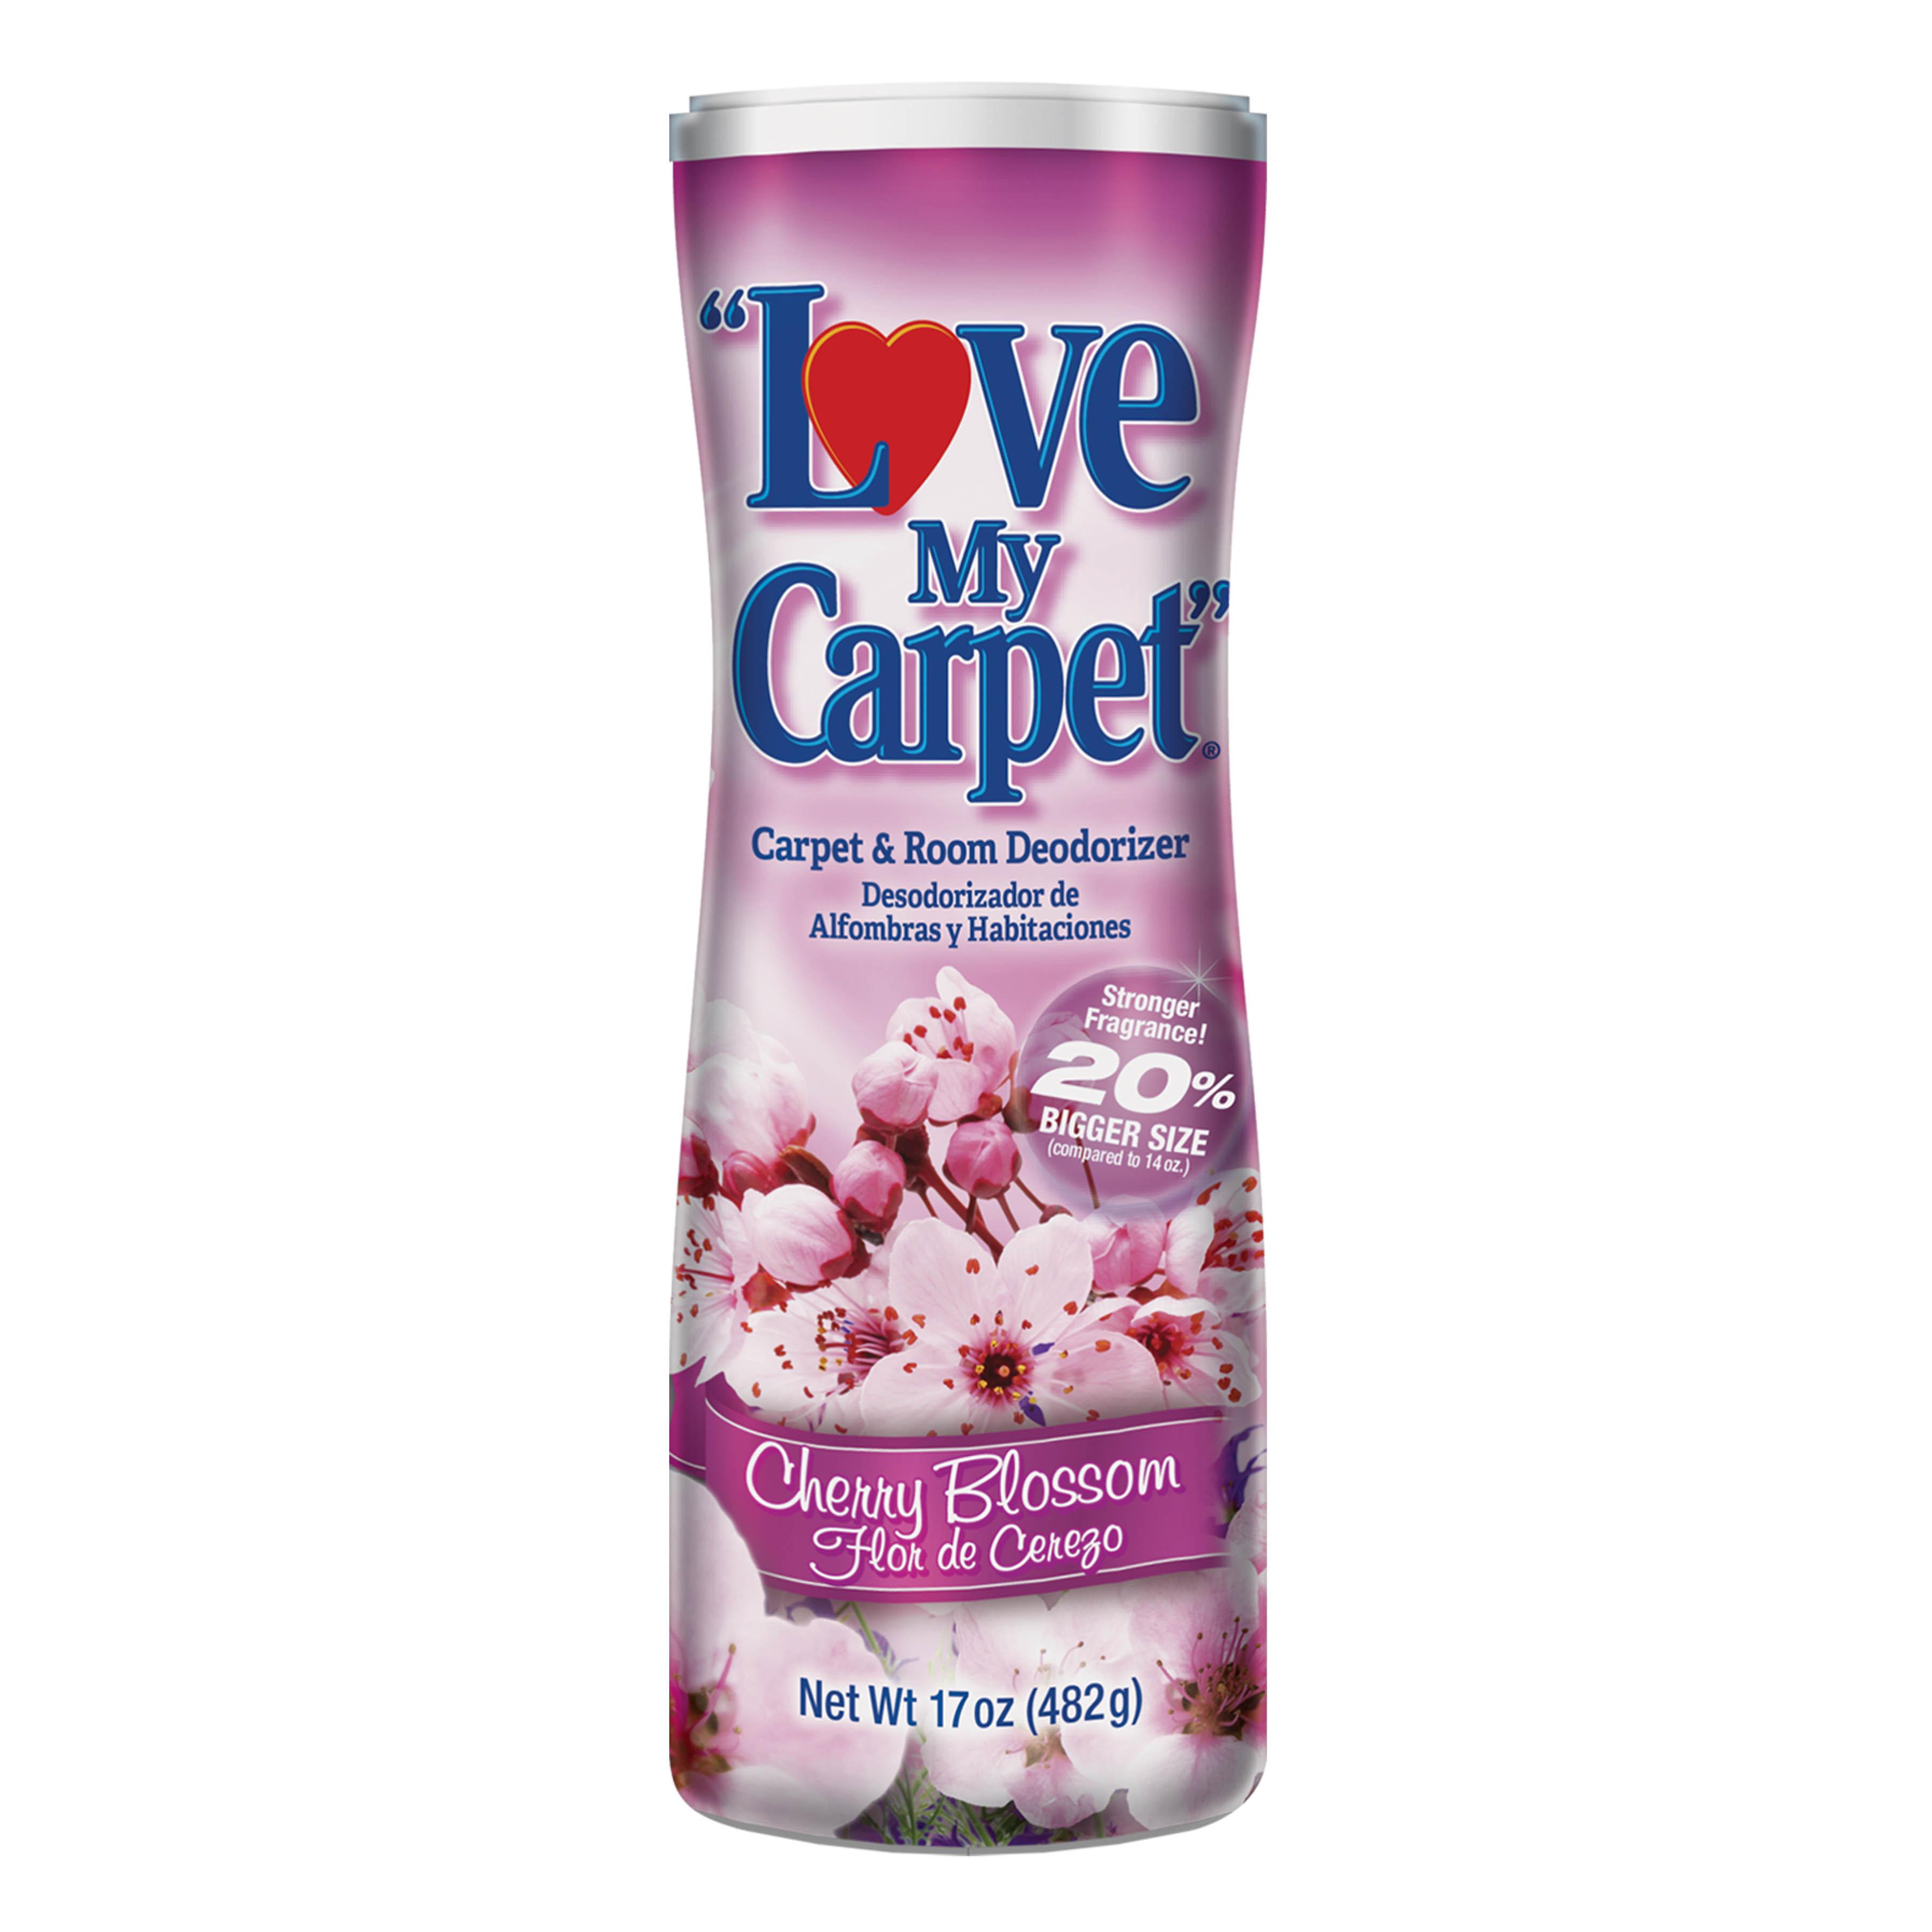 Love My Carpet, Cherry Blossom